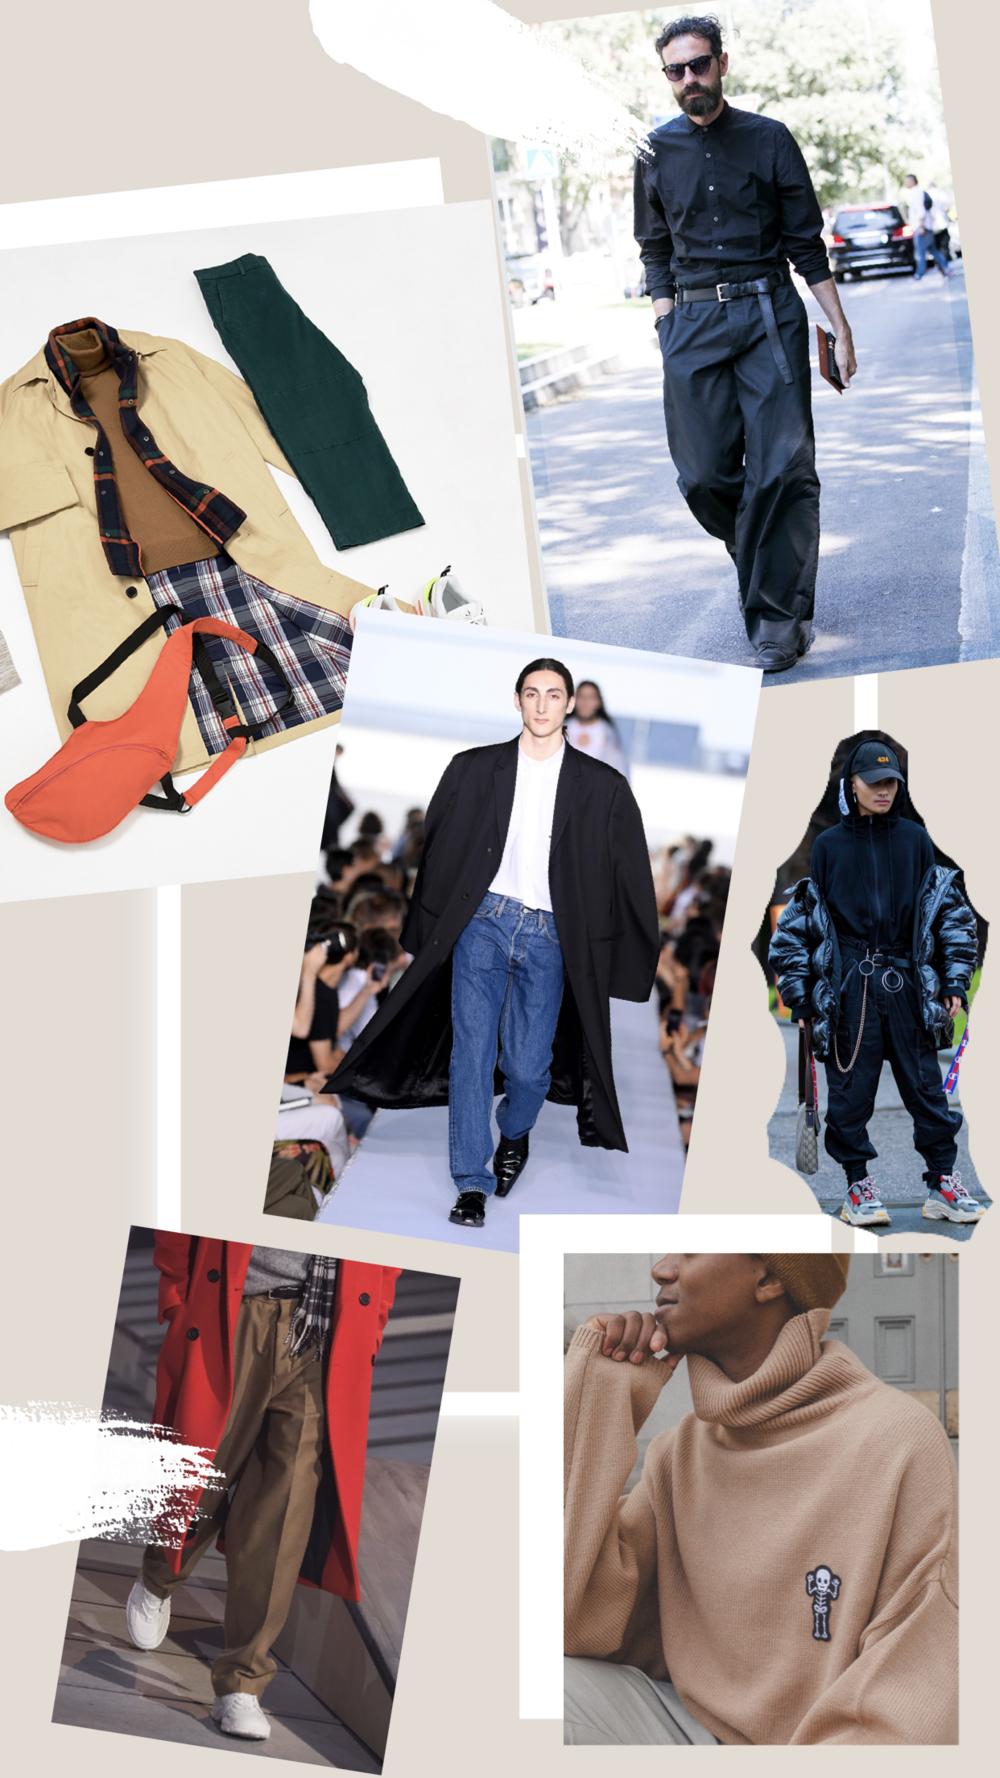 dbd99b25e43b2 8 SS19 Men s Fashion Trends To Know Blog post